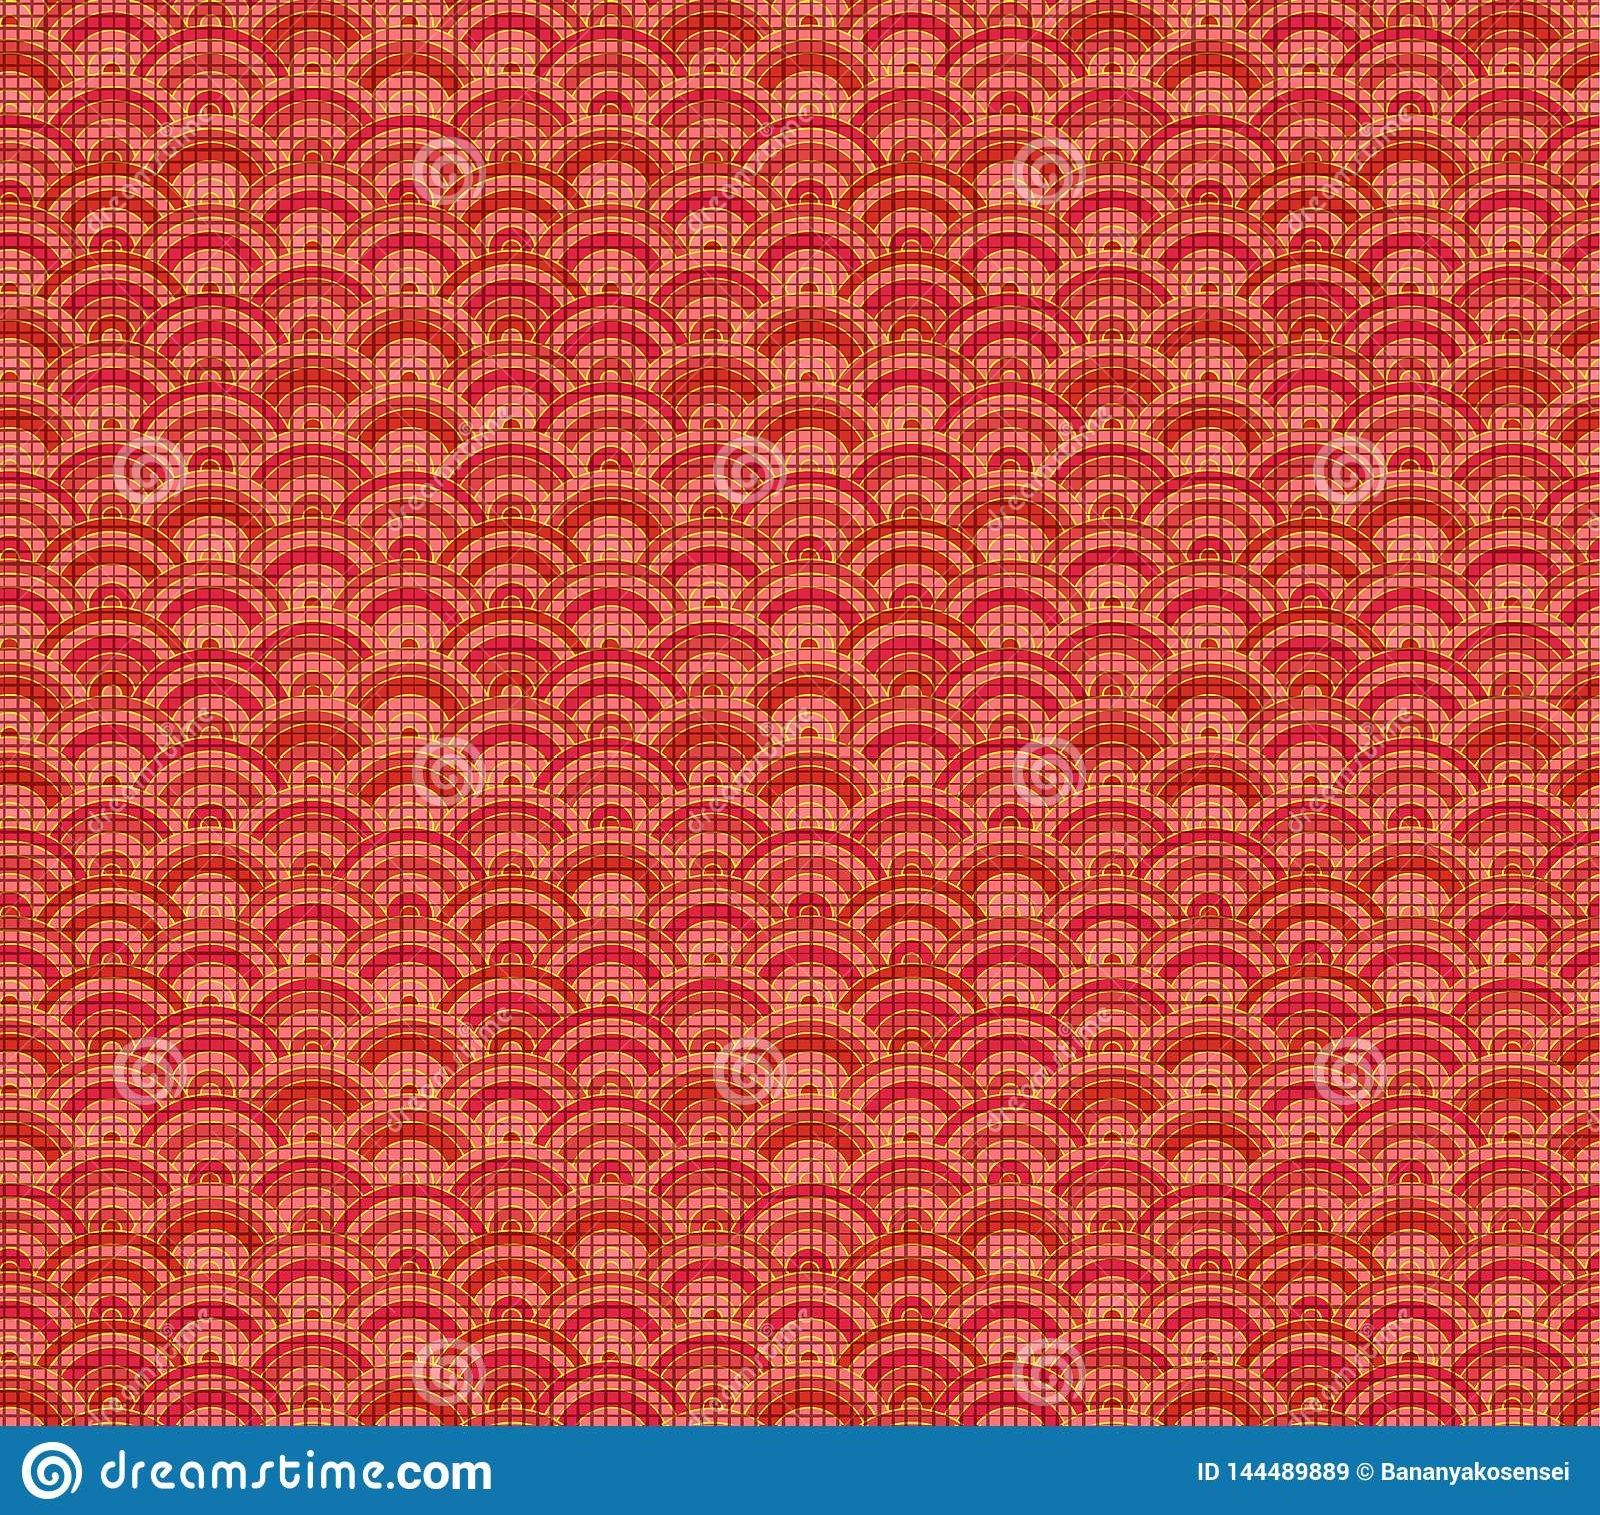 Vector Chinees Patroon, Naadloze Achtergrond, Linnen Rode Textiel